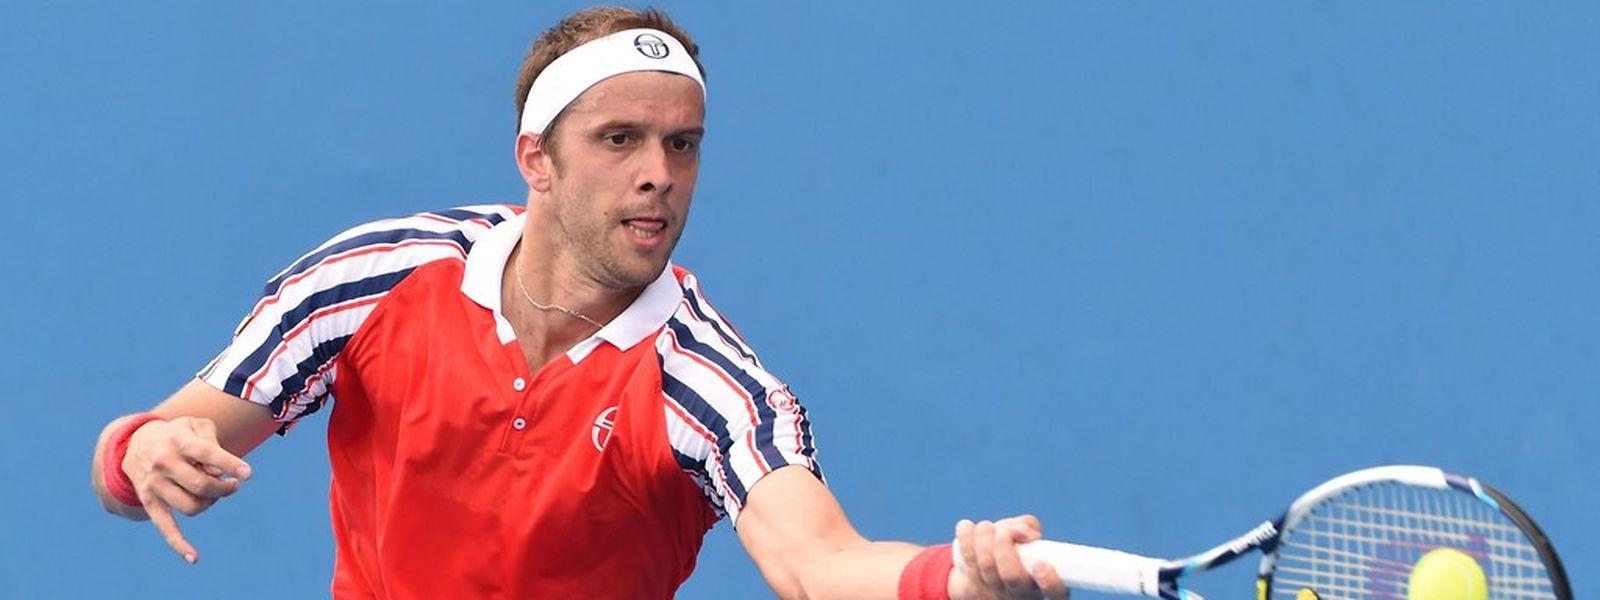 Gilles Muller steht in der dritten Runde der Australian Open.